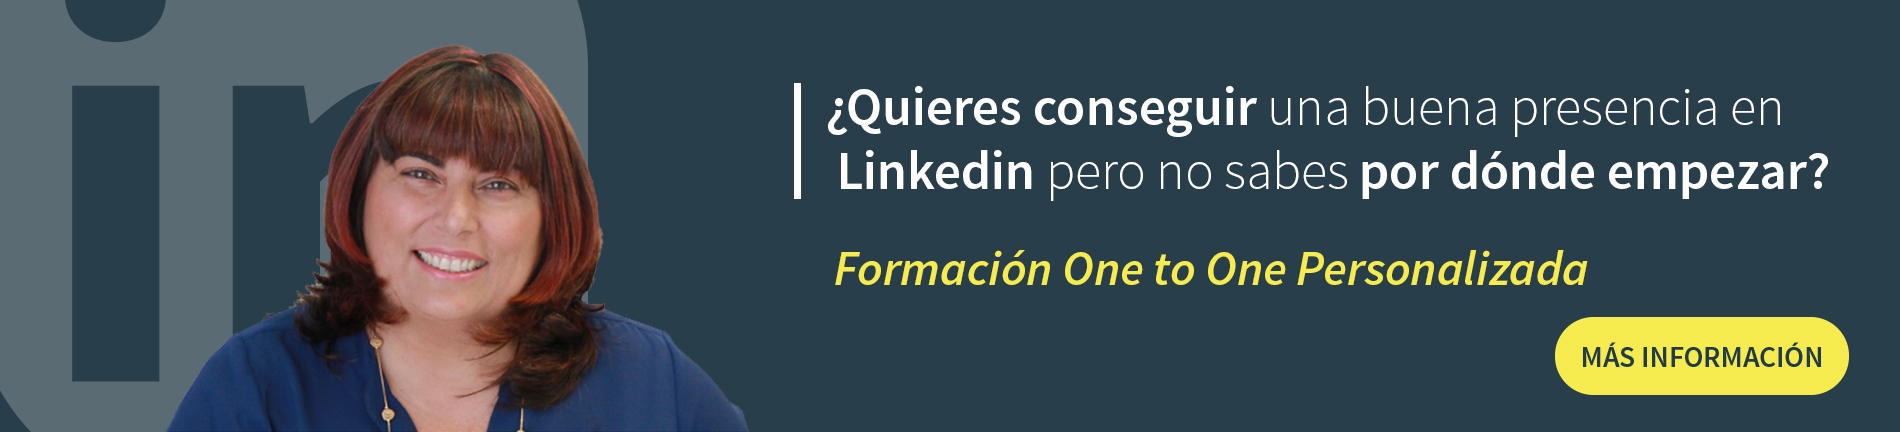 formación Linkedin